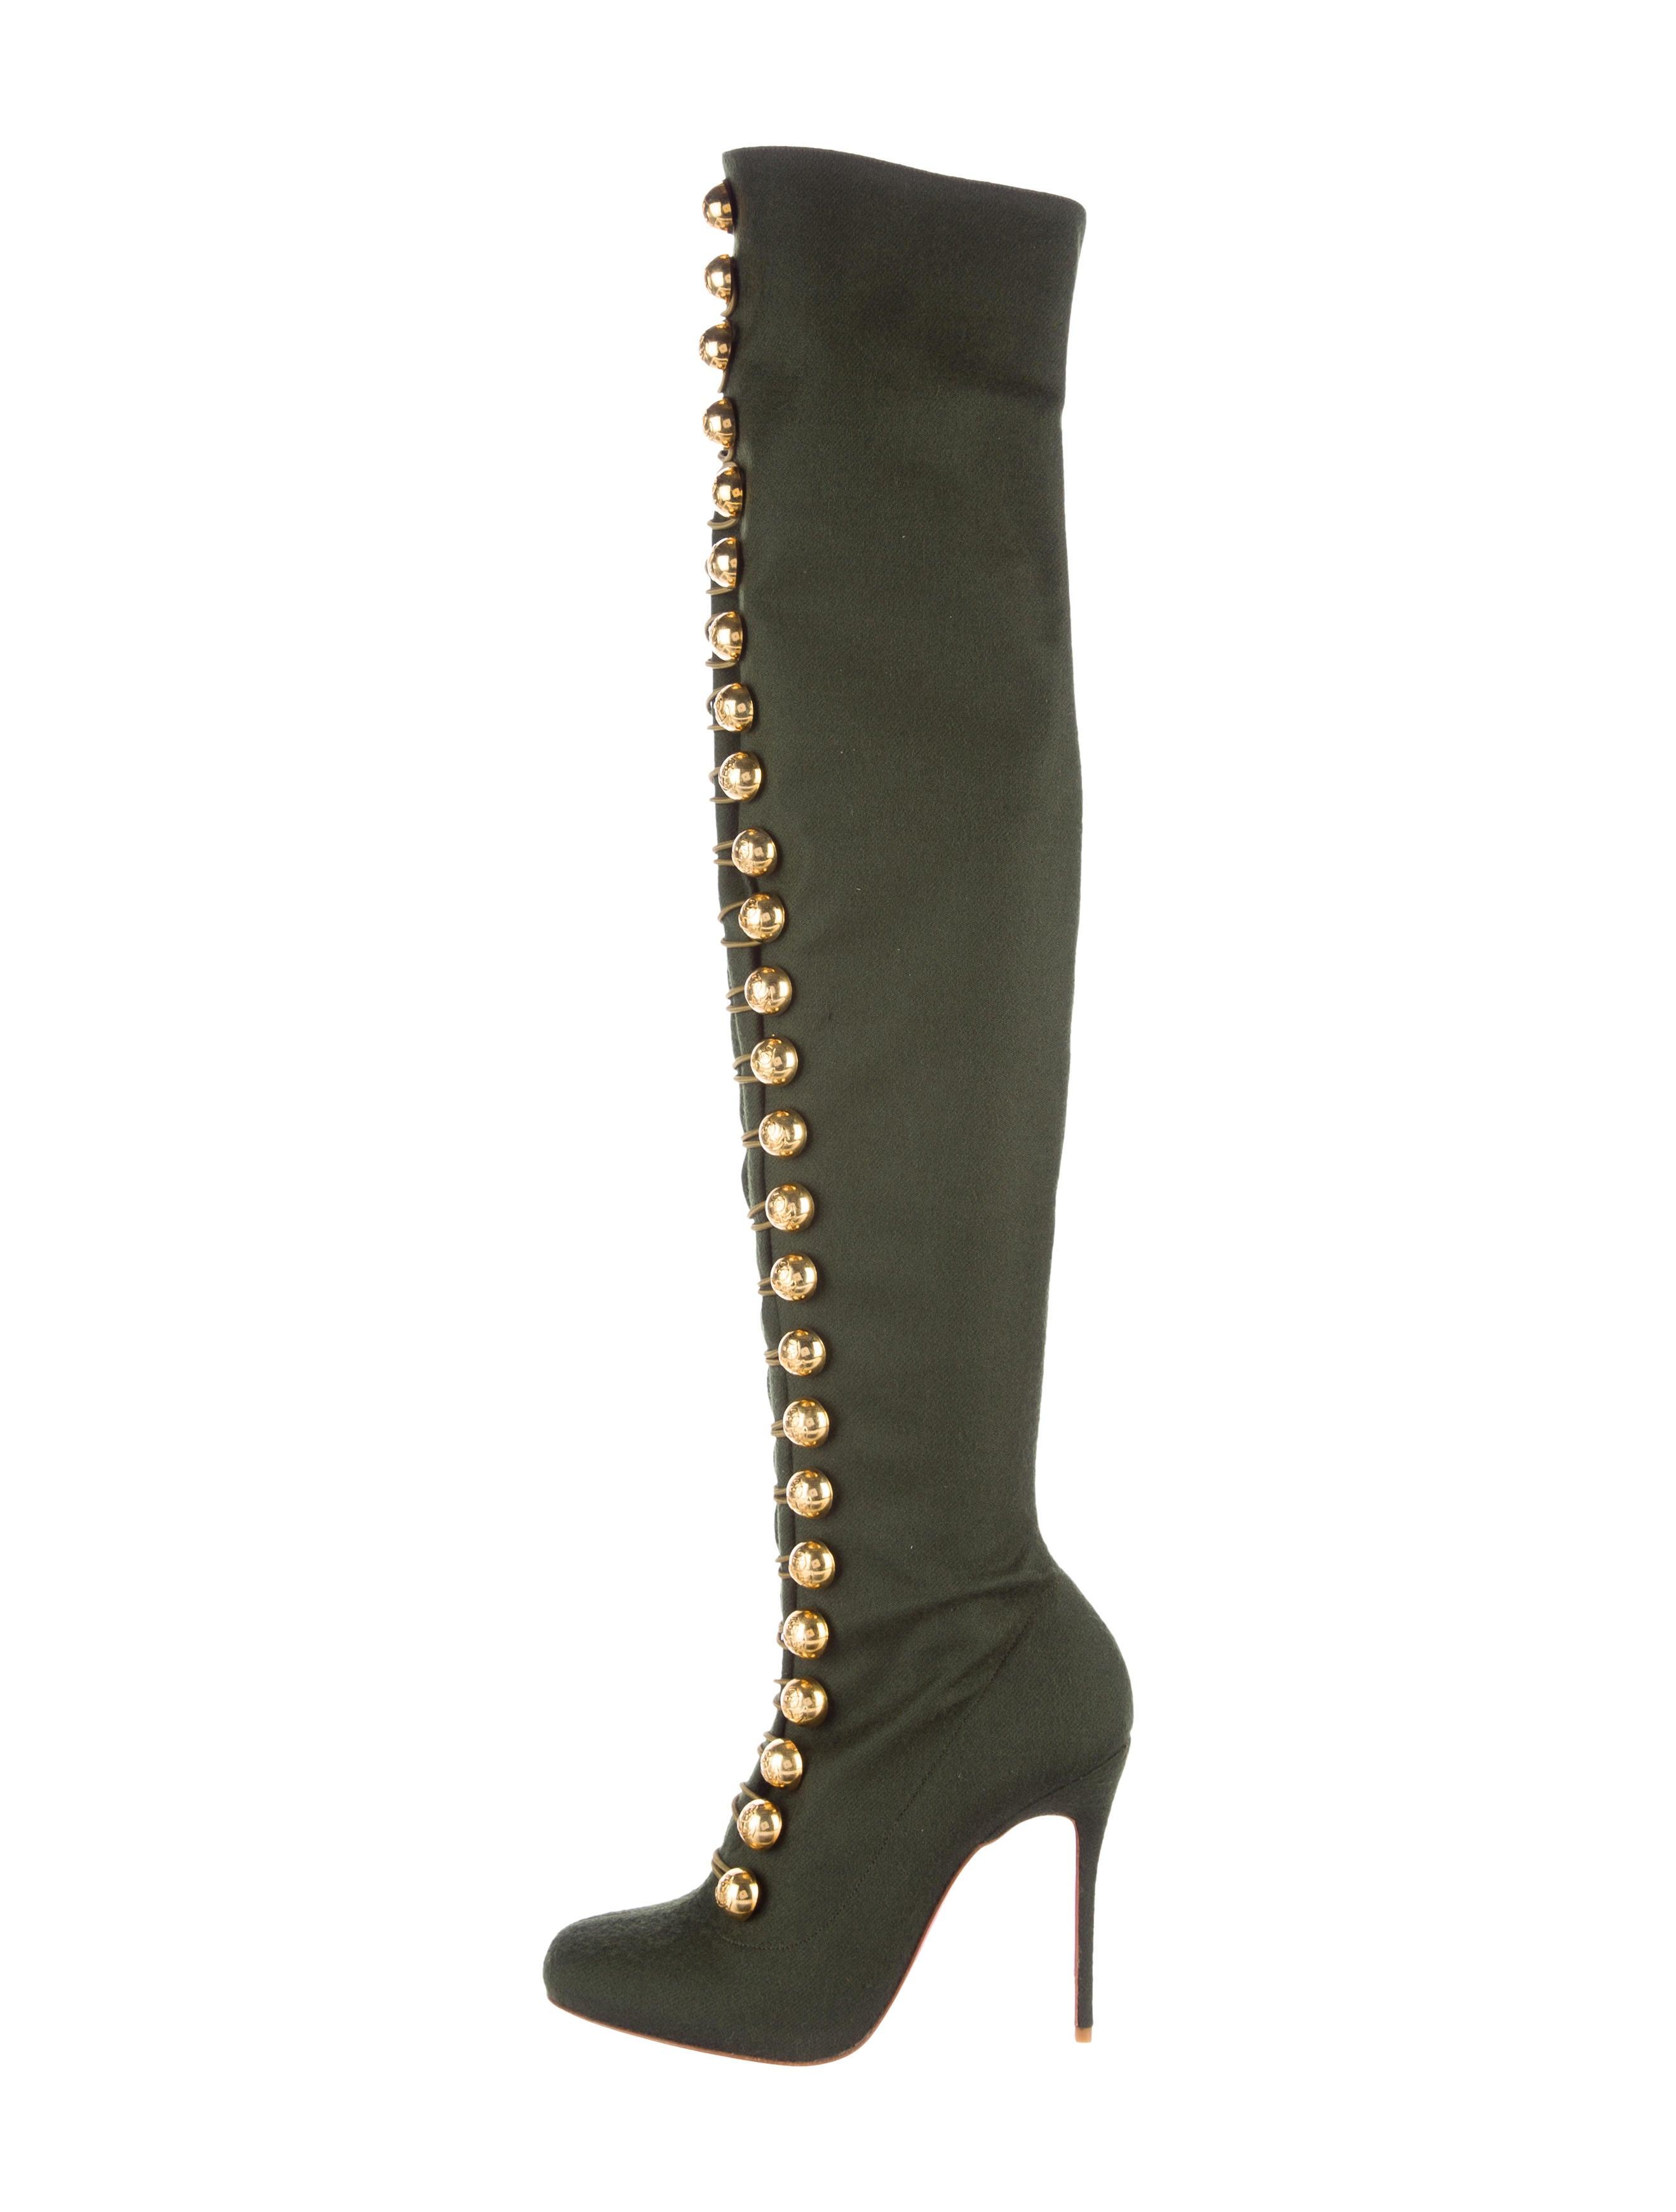 1dfe4de9f289 Christian Louboutin Ronfifi Supra 100 Over-The-Knee Boots - Shoes ...